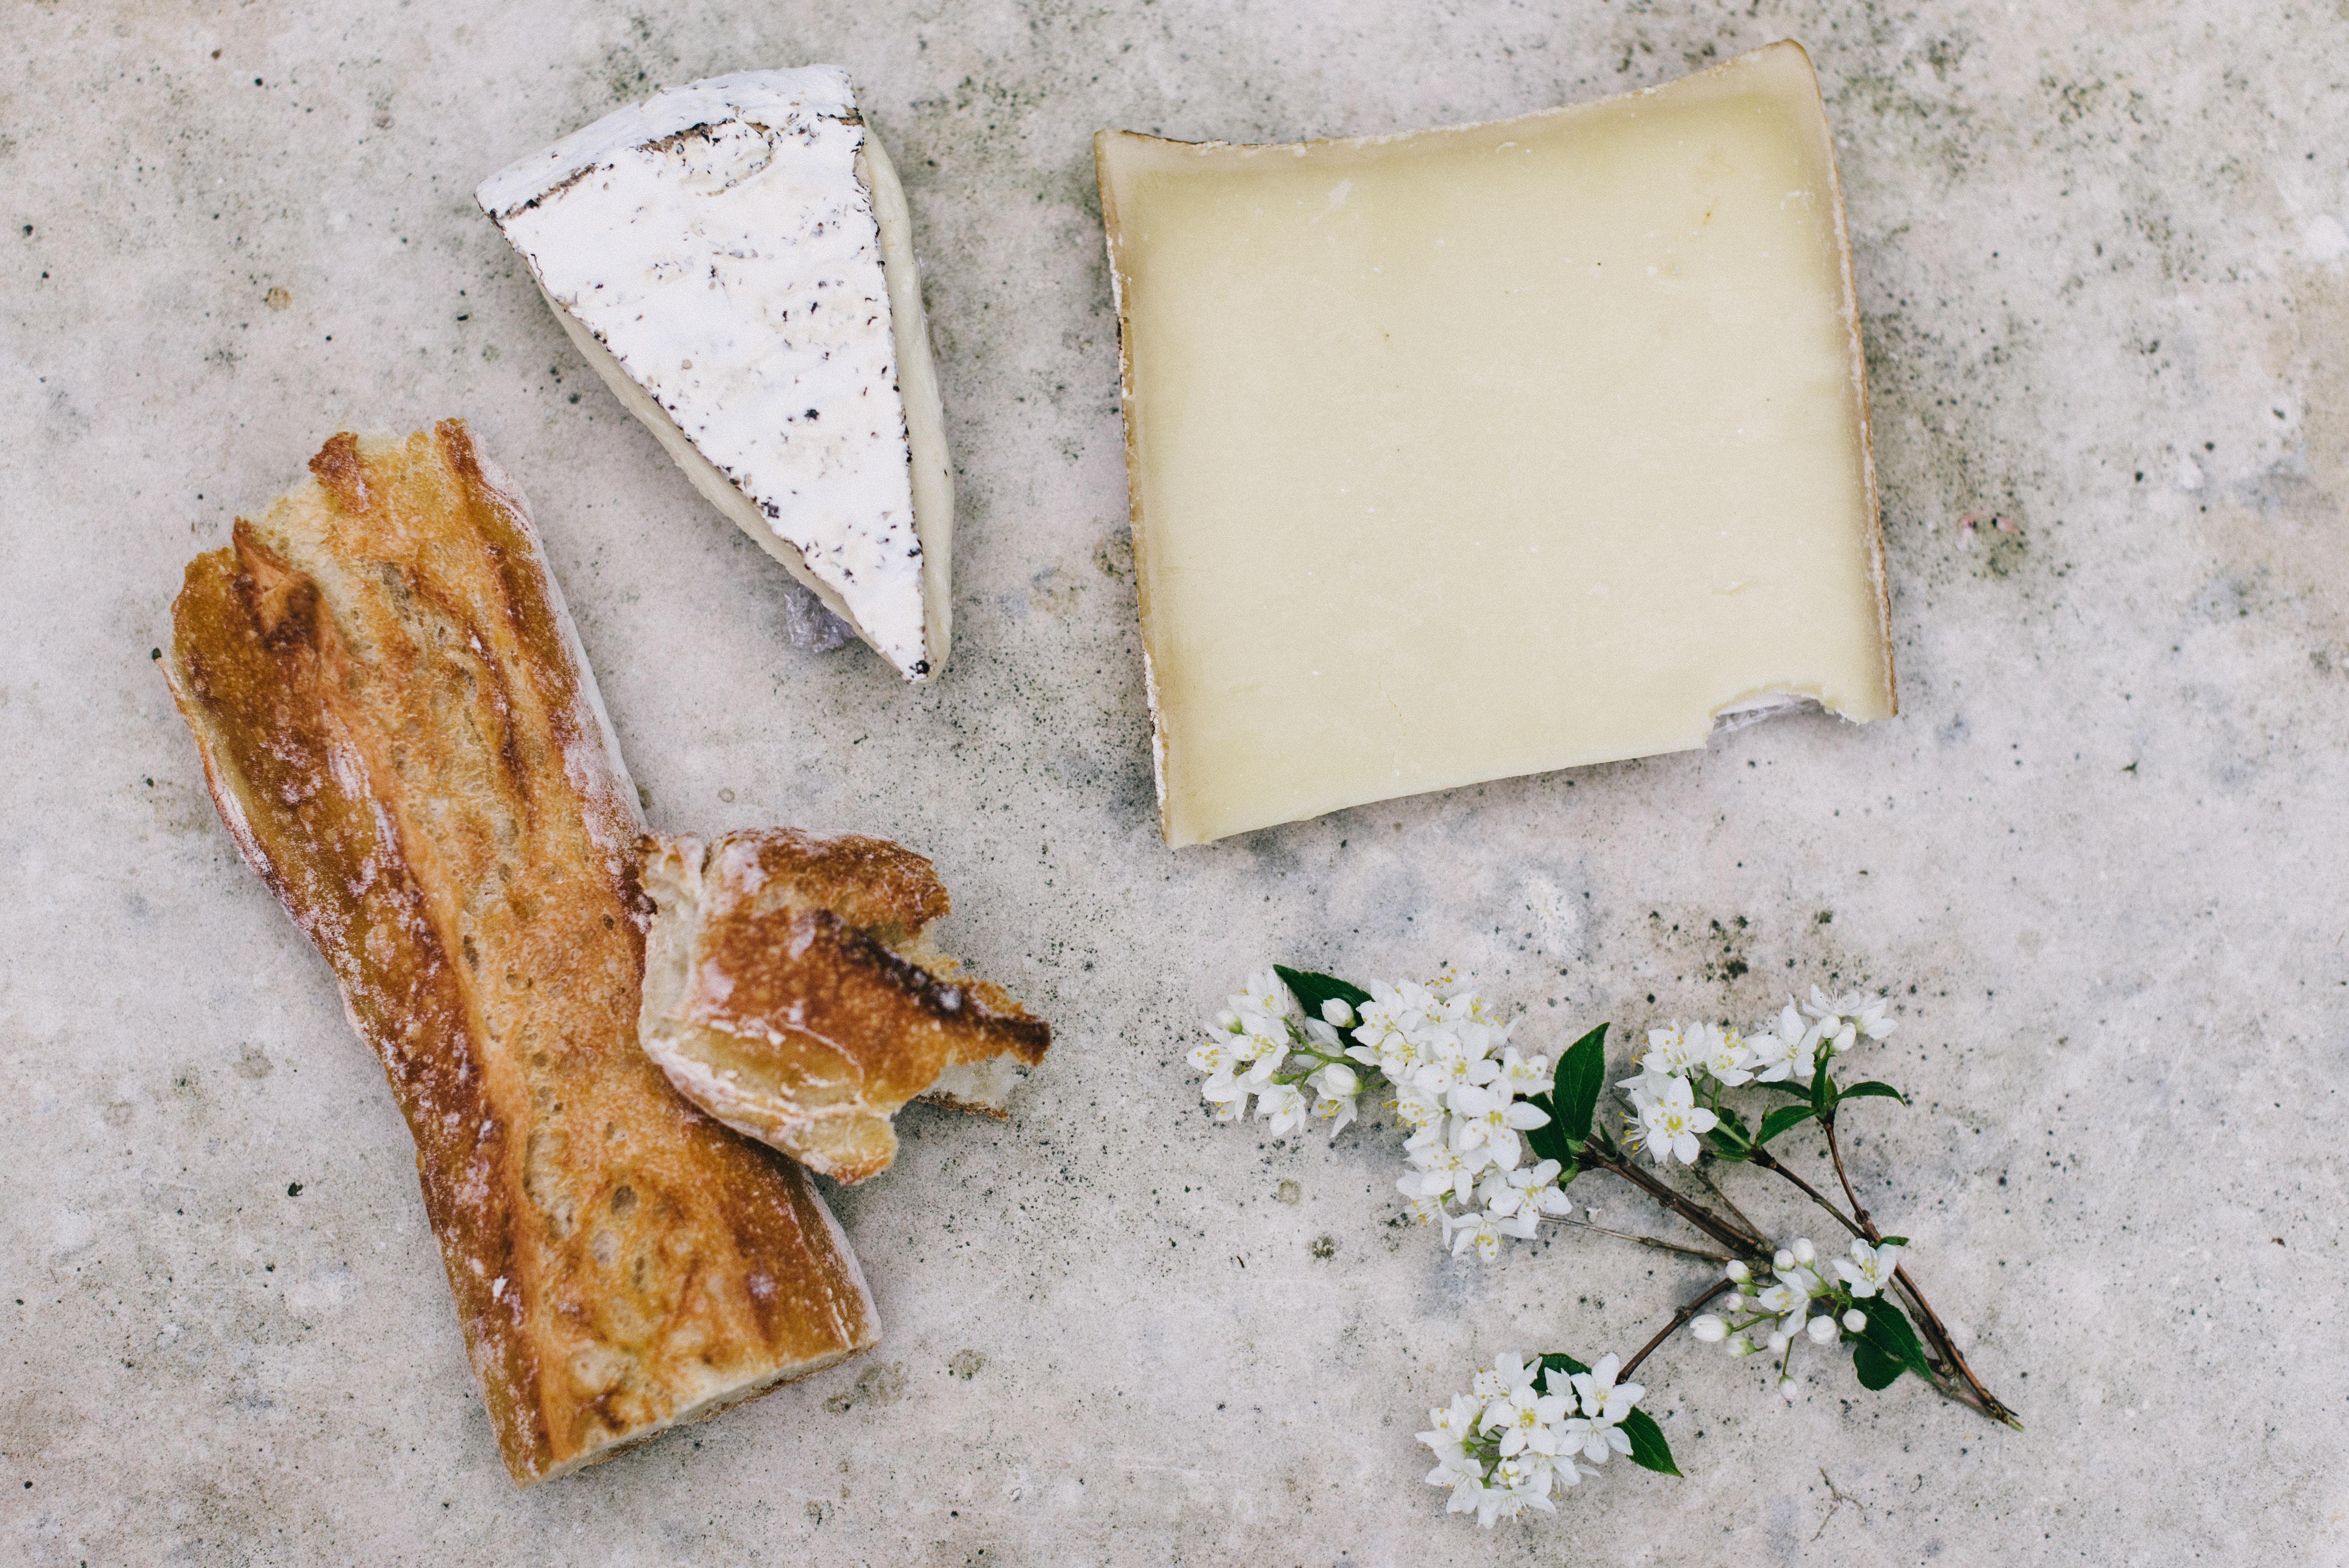 Italian Cheese + Breads